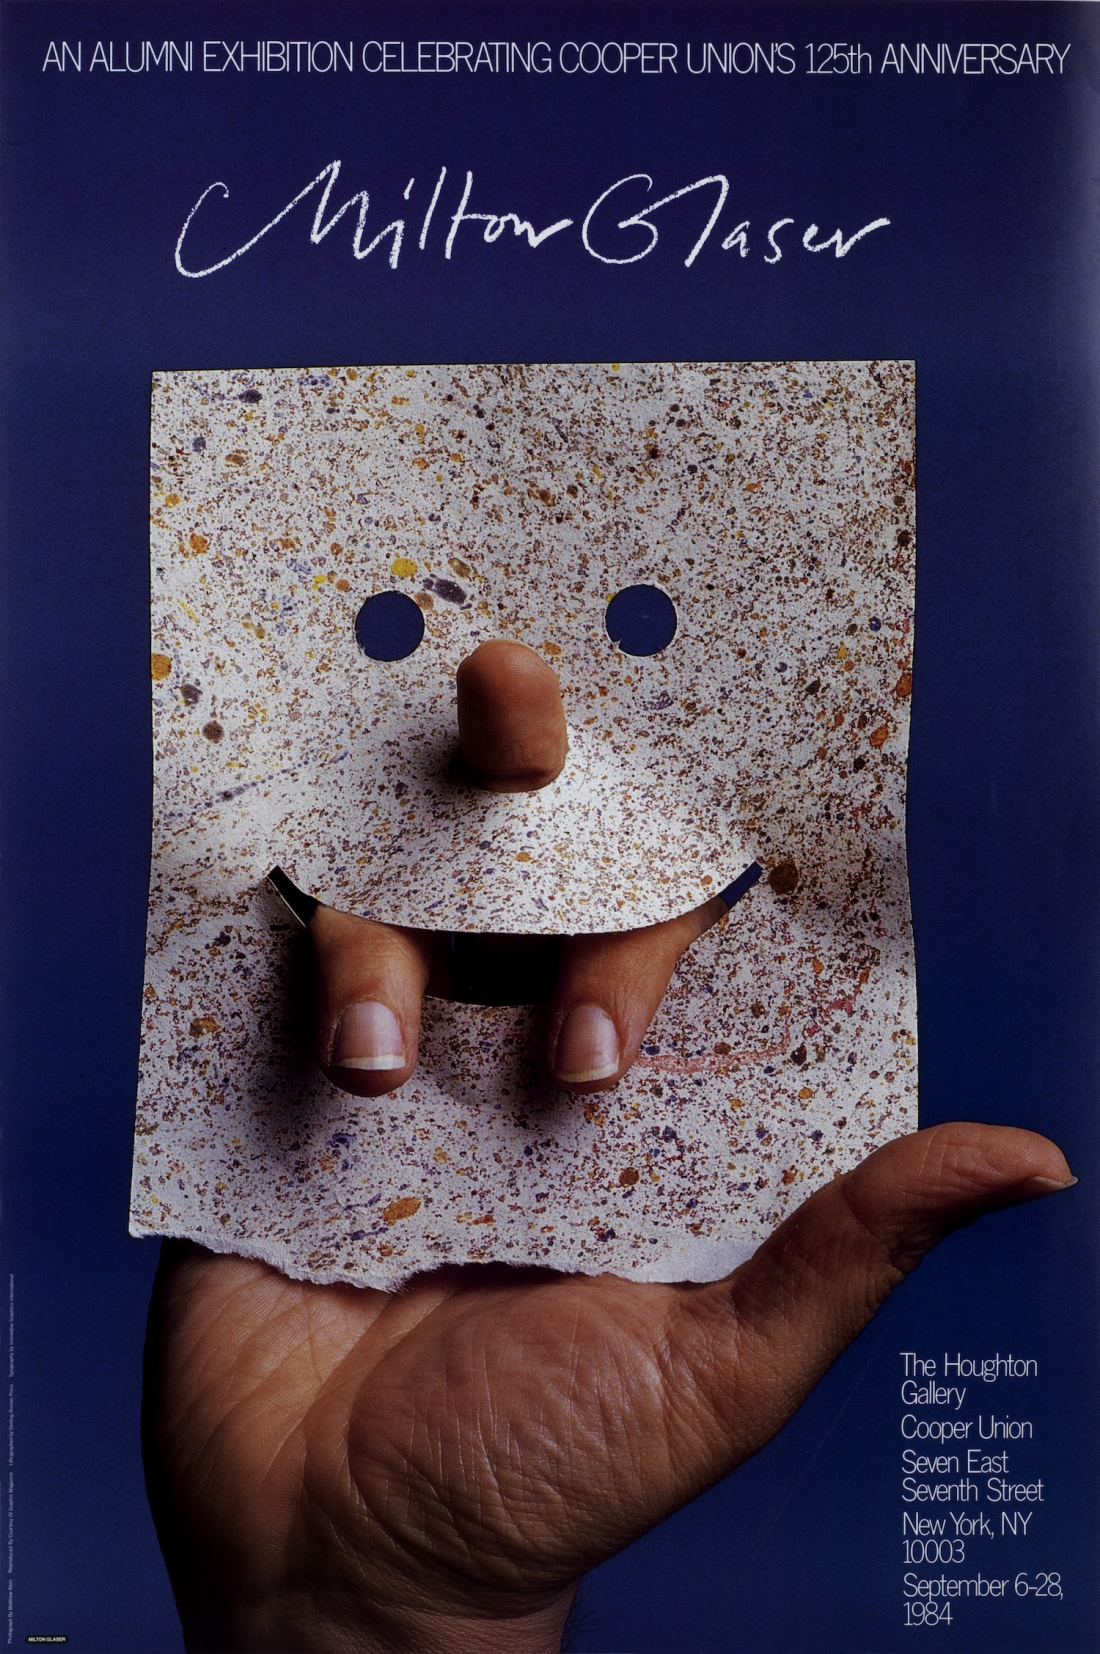 "Milton Glaser 1984. 4-color offset lithography, 36 x 24"" Client: Cooper Union"